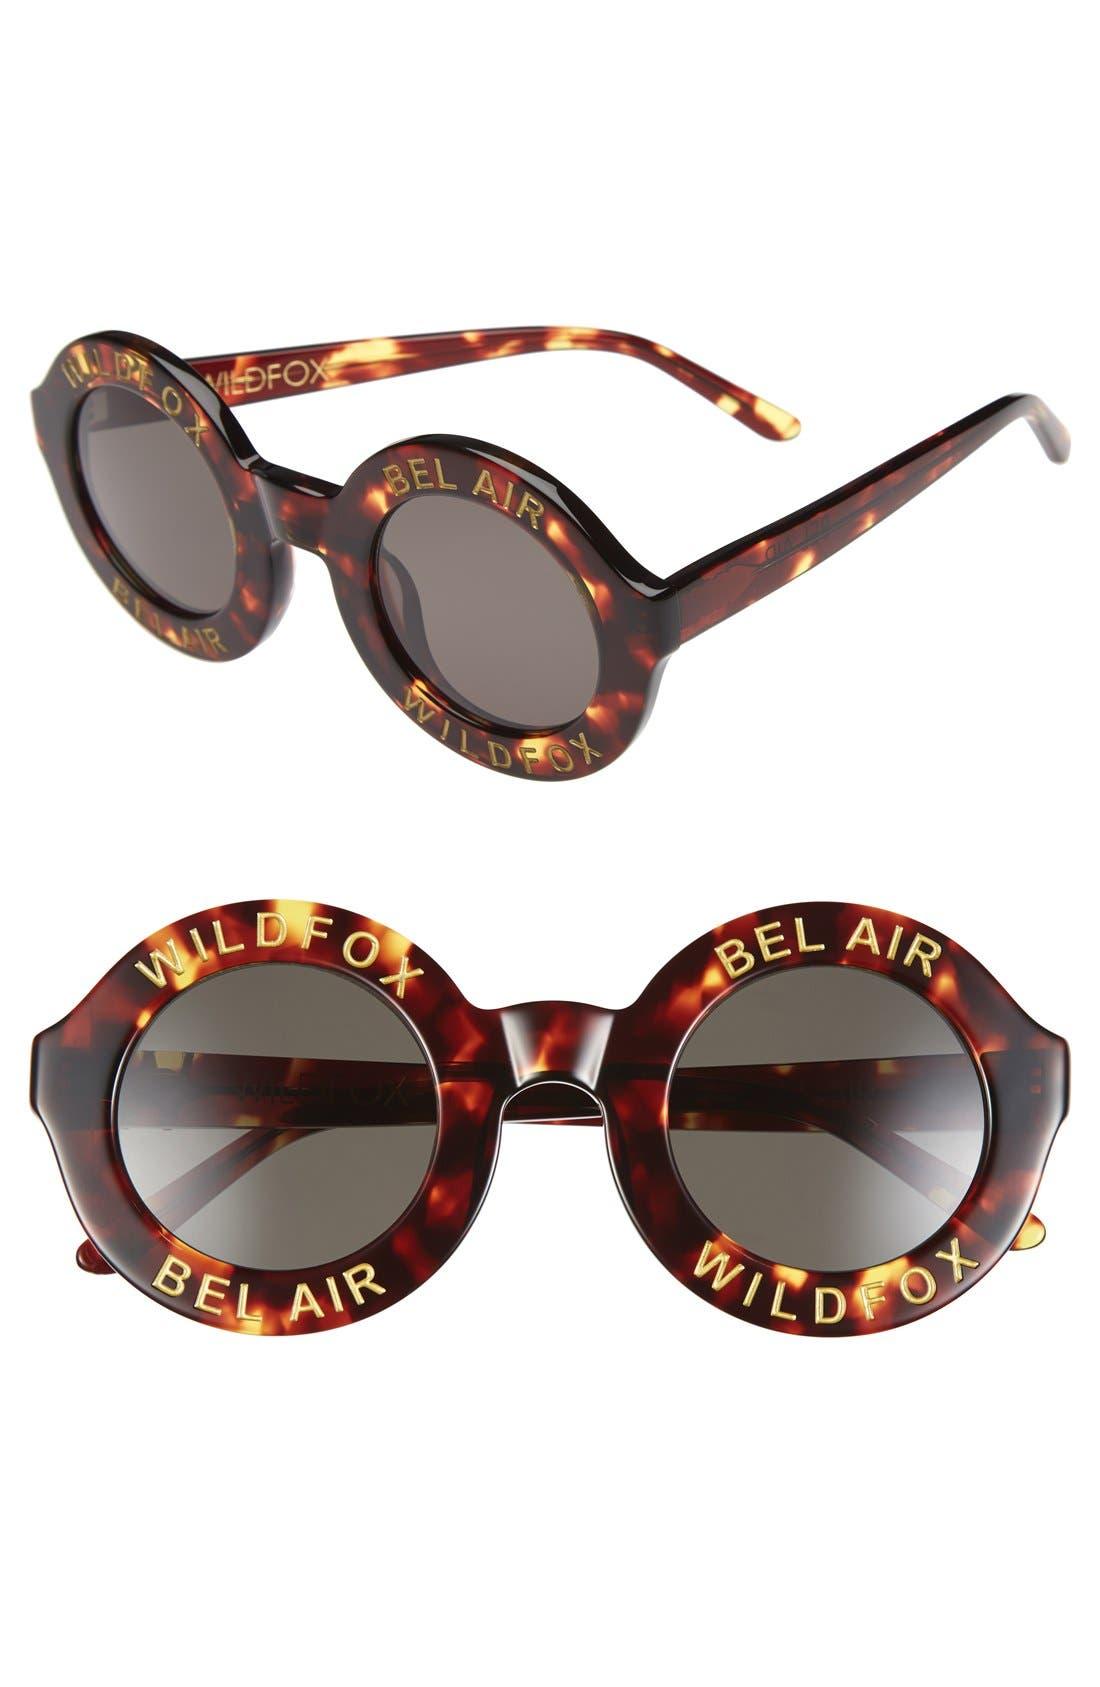 Wildfox 'Bel Air' 44mm Sunglasses